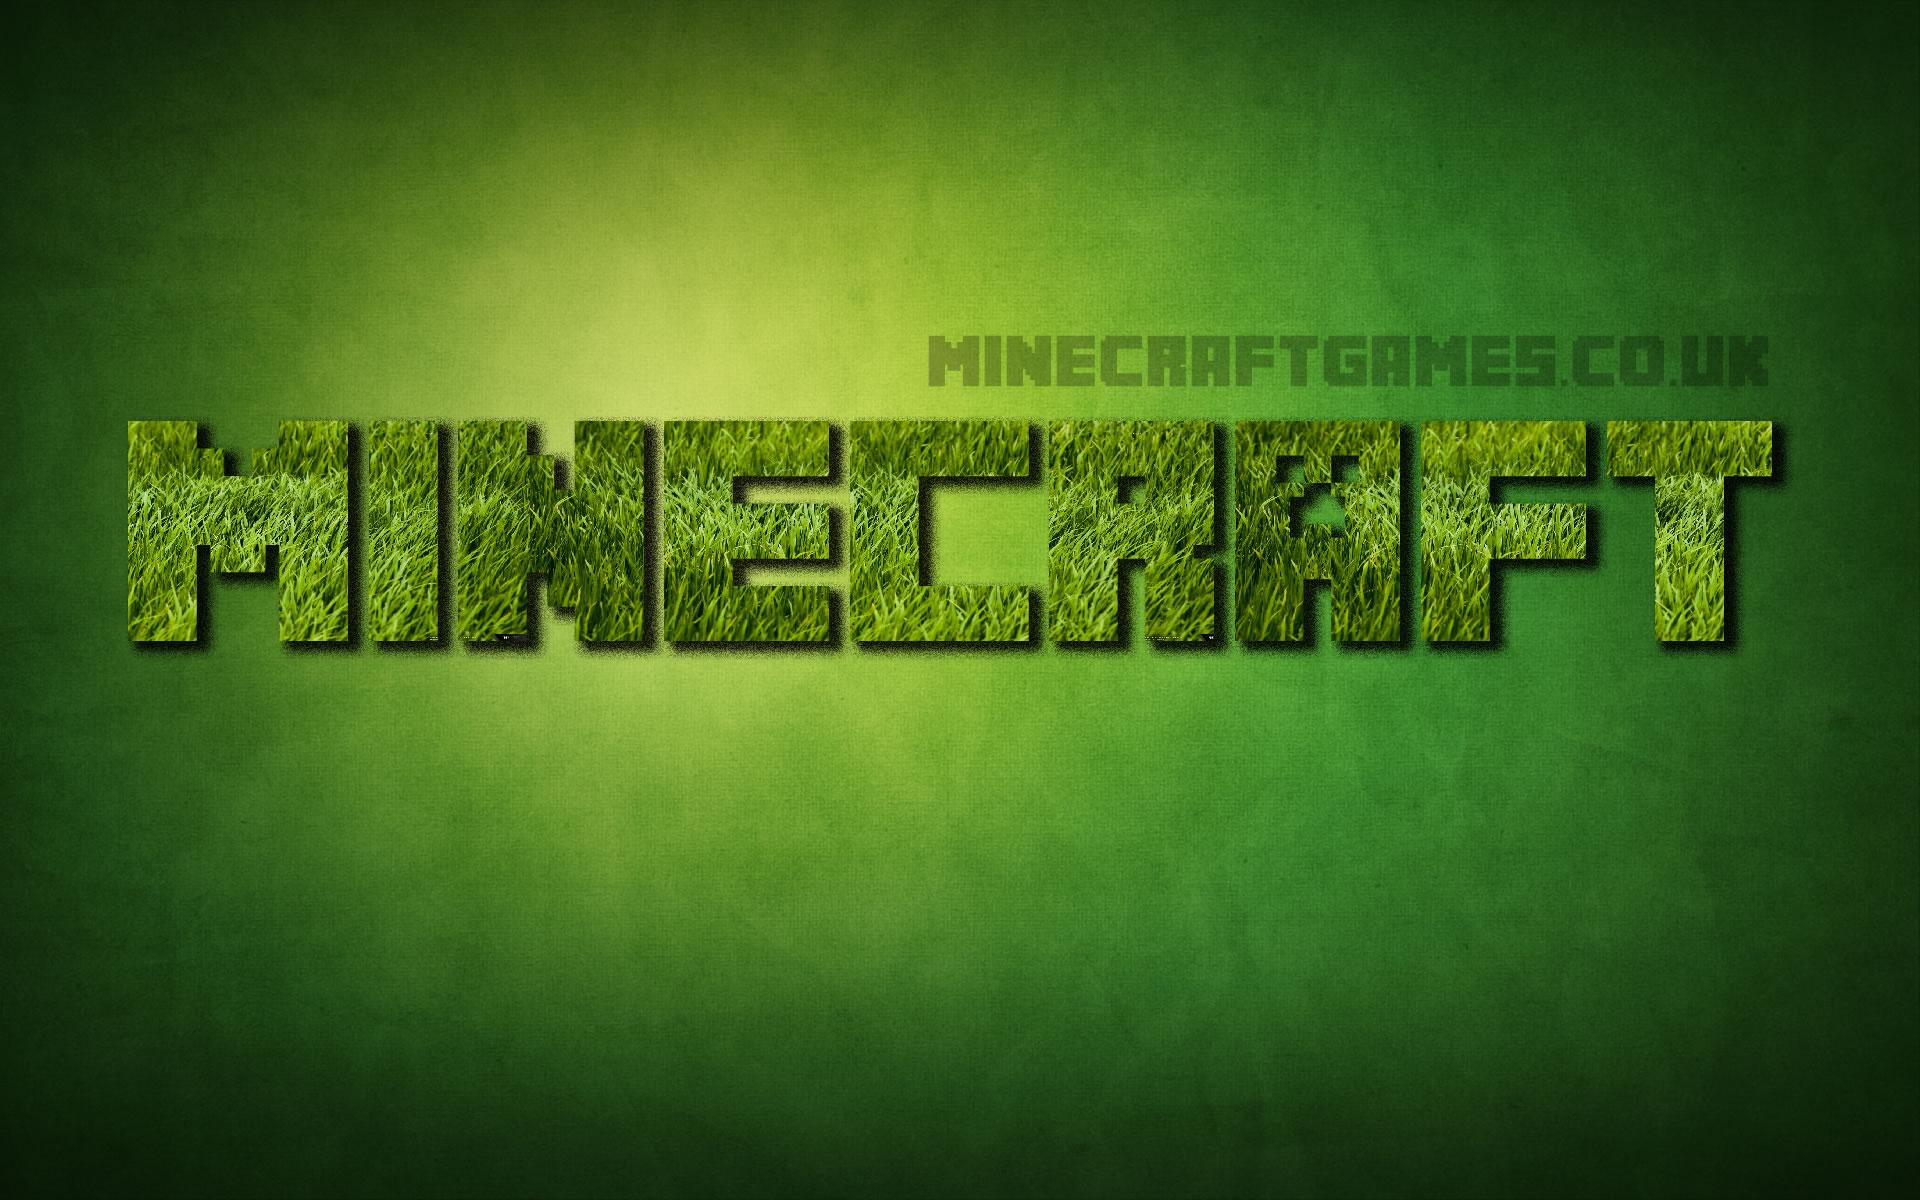 Minecraft Wallpaper Mobile Content